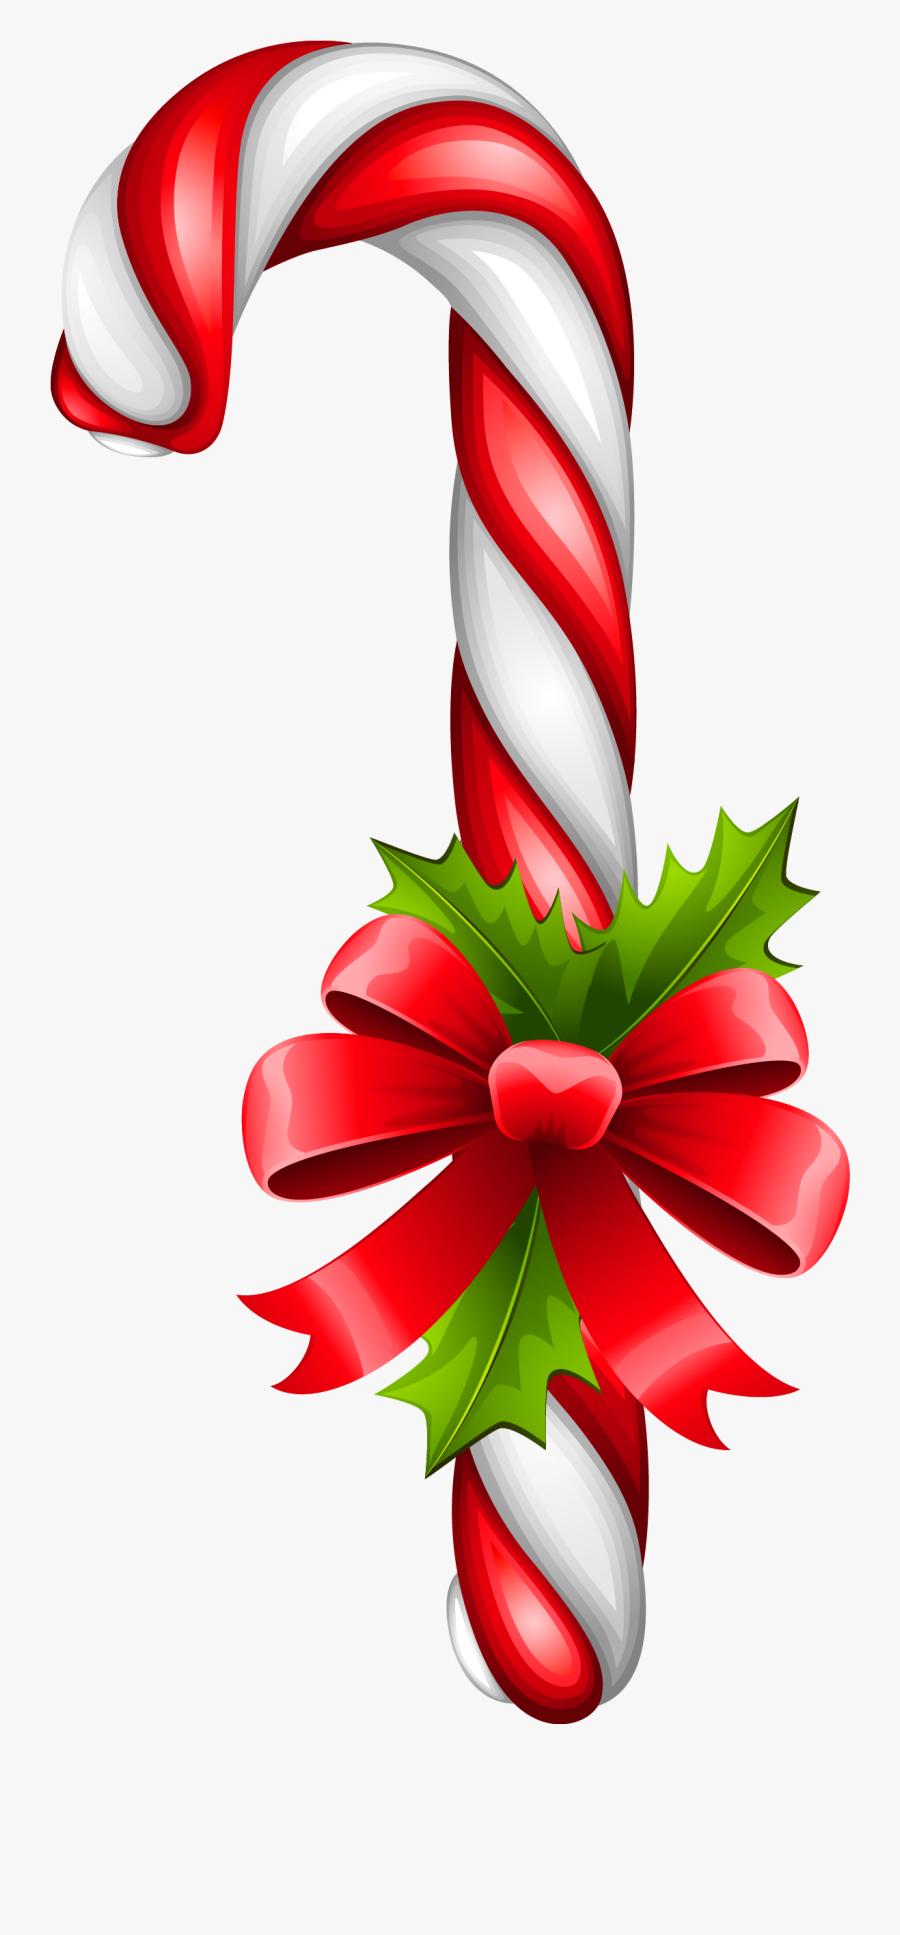 Free Clip Art Fun - Christmas Candy Cane Transparent, Transparent Clipart